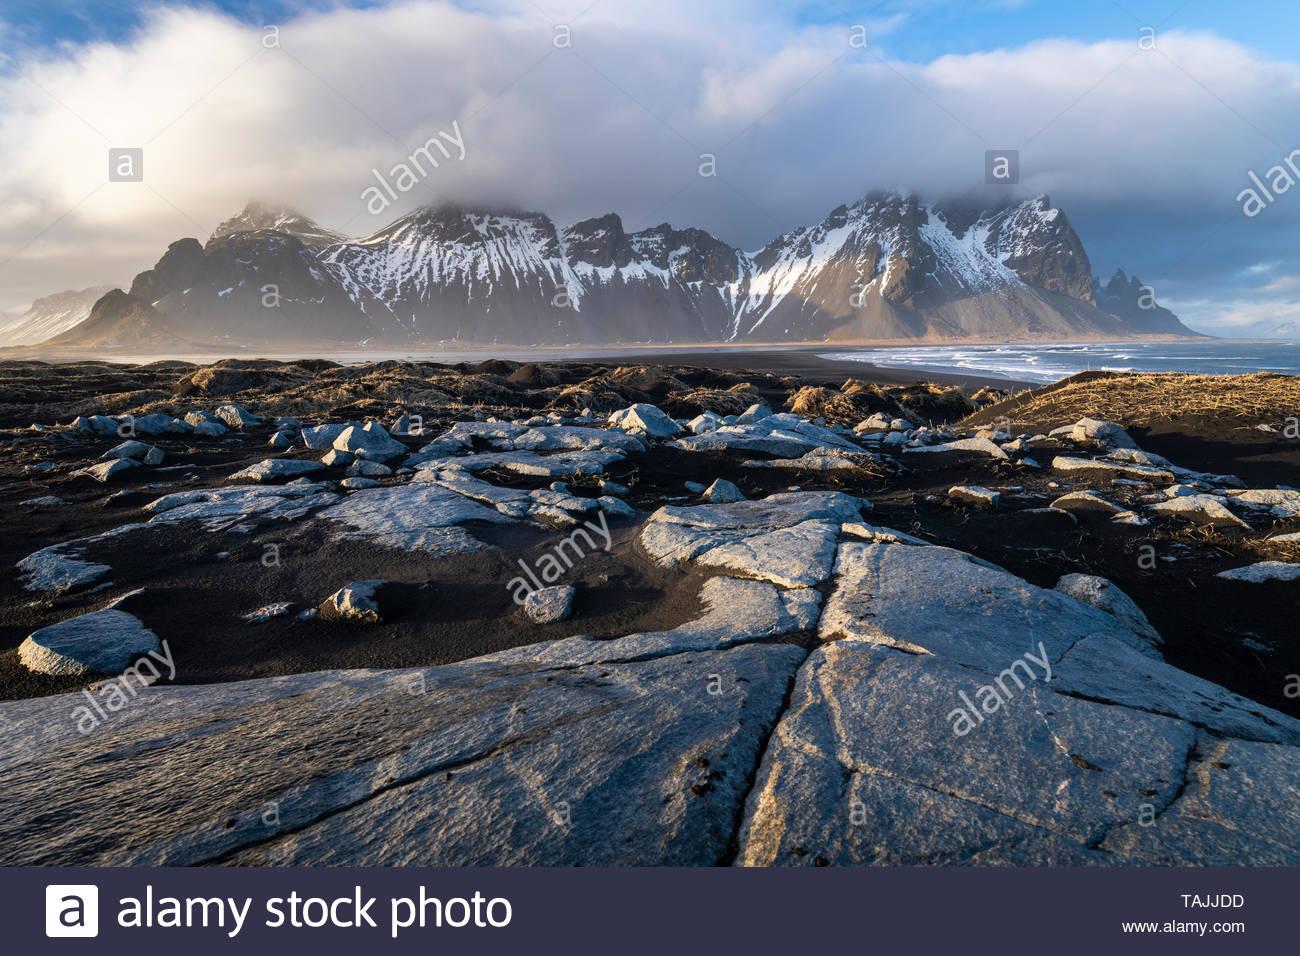 Stokksnes cape and Vestrahorn Mountain during sunset. Eastern Iceland landscape. Stock Photo